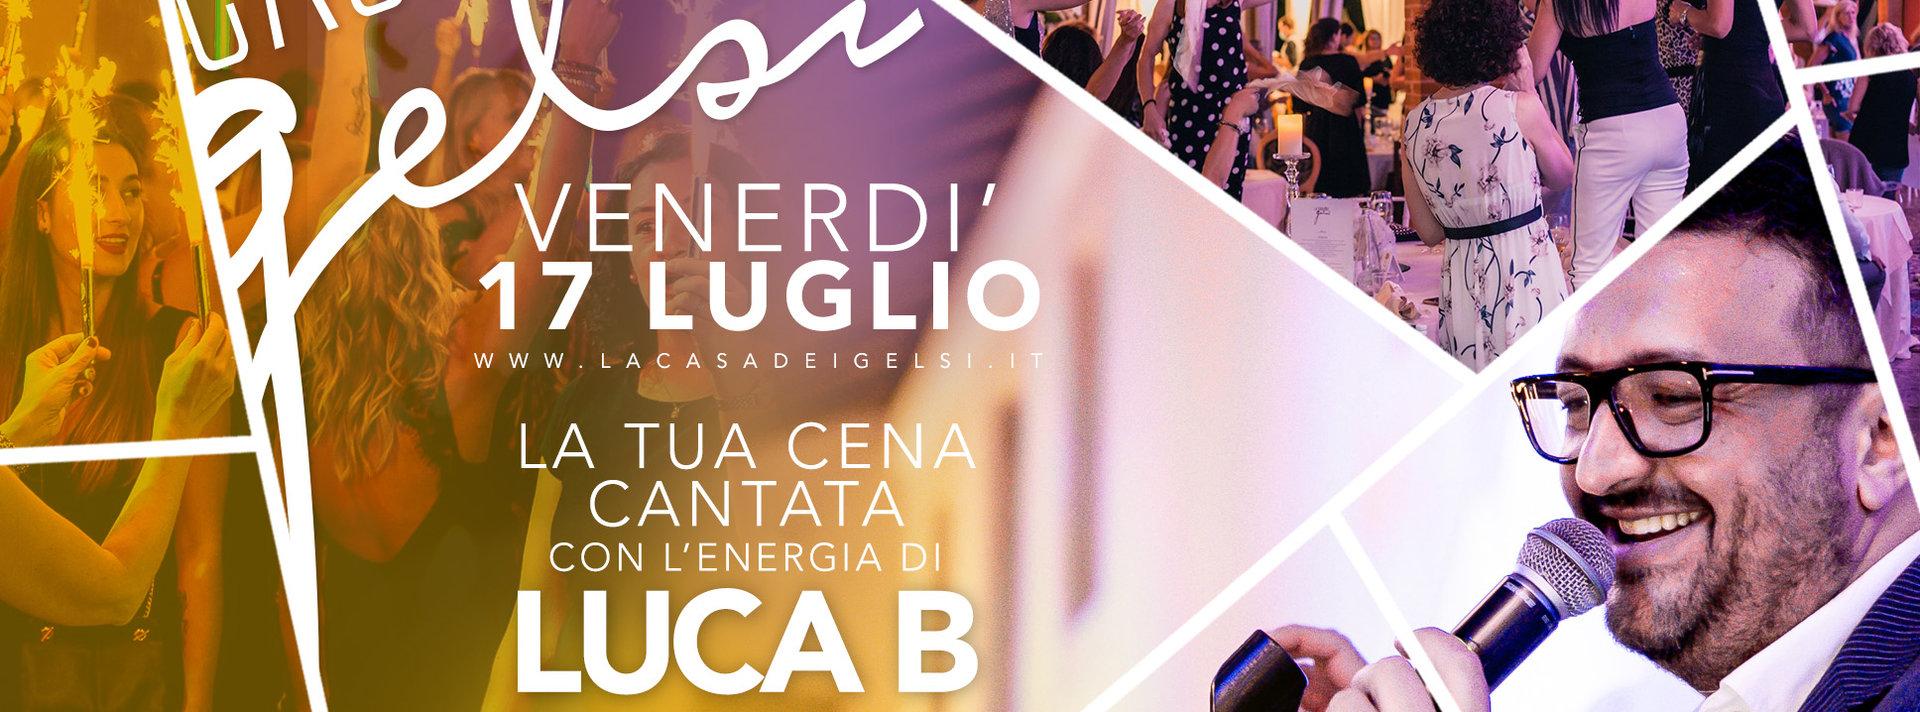 Cena cantata Luca B Gelsi - 17 luglio 2020